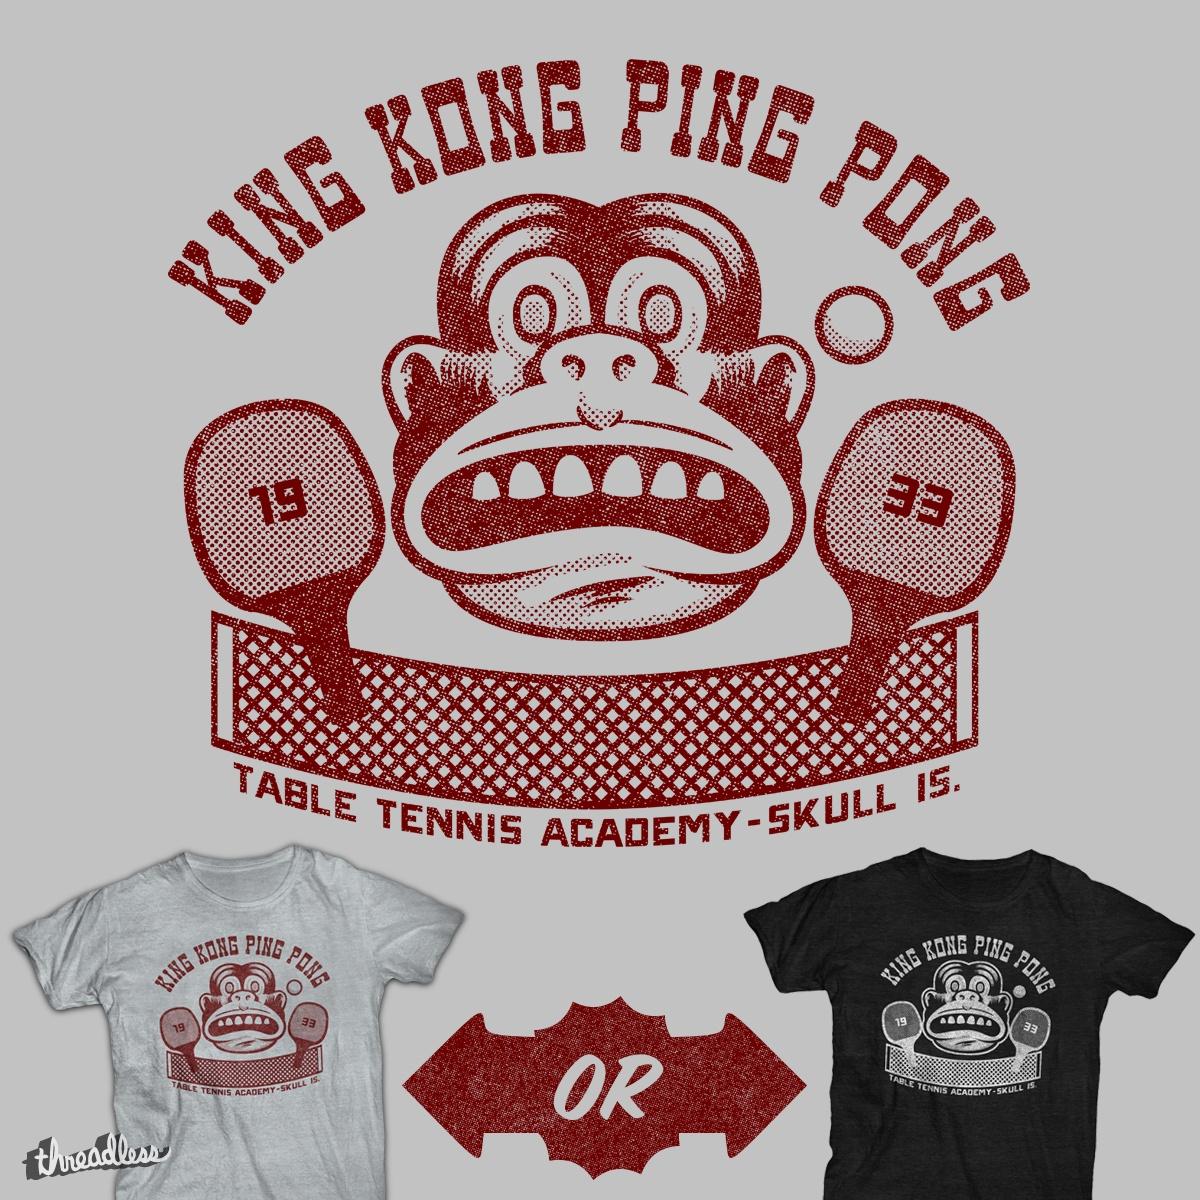 King Kong Ping Pong! by r.o.b.o.t.i.c.octopus on Threadless